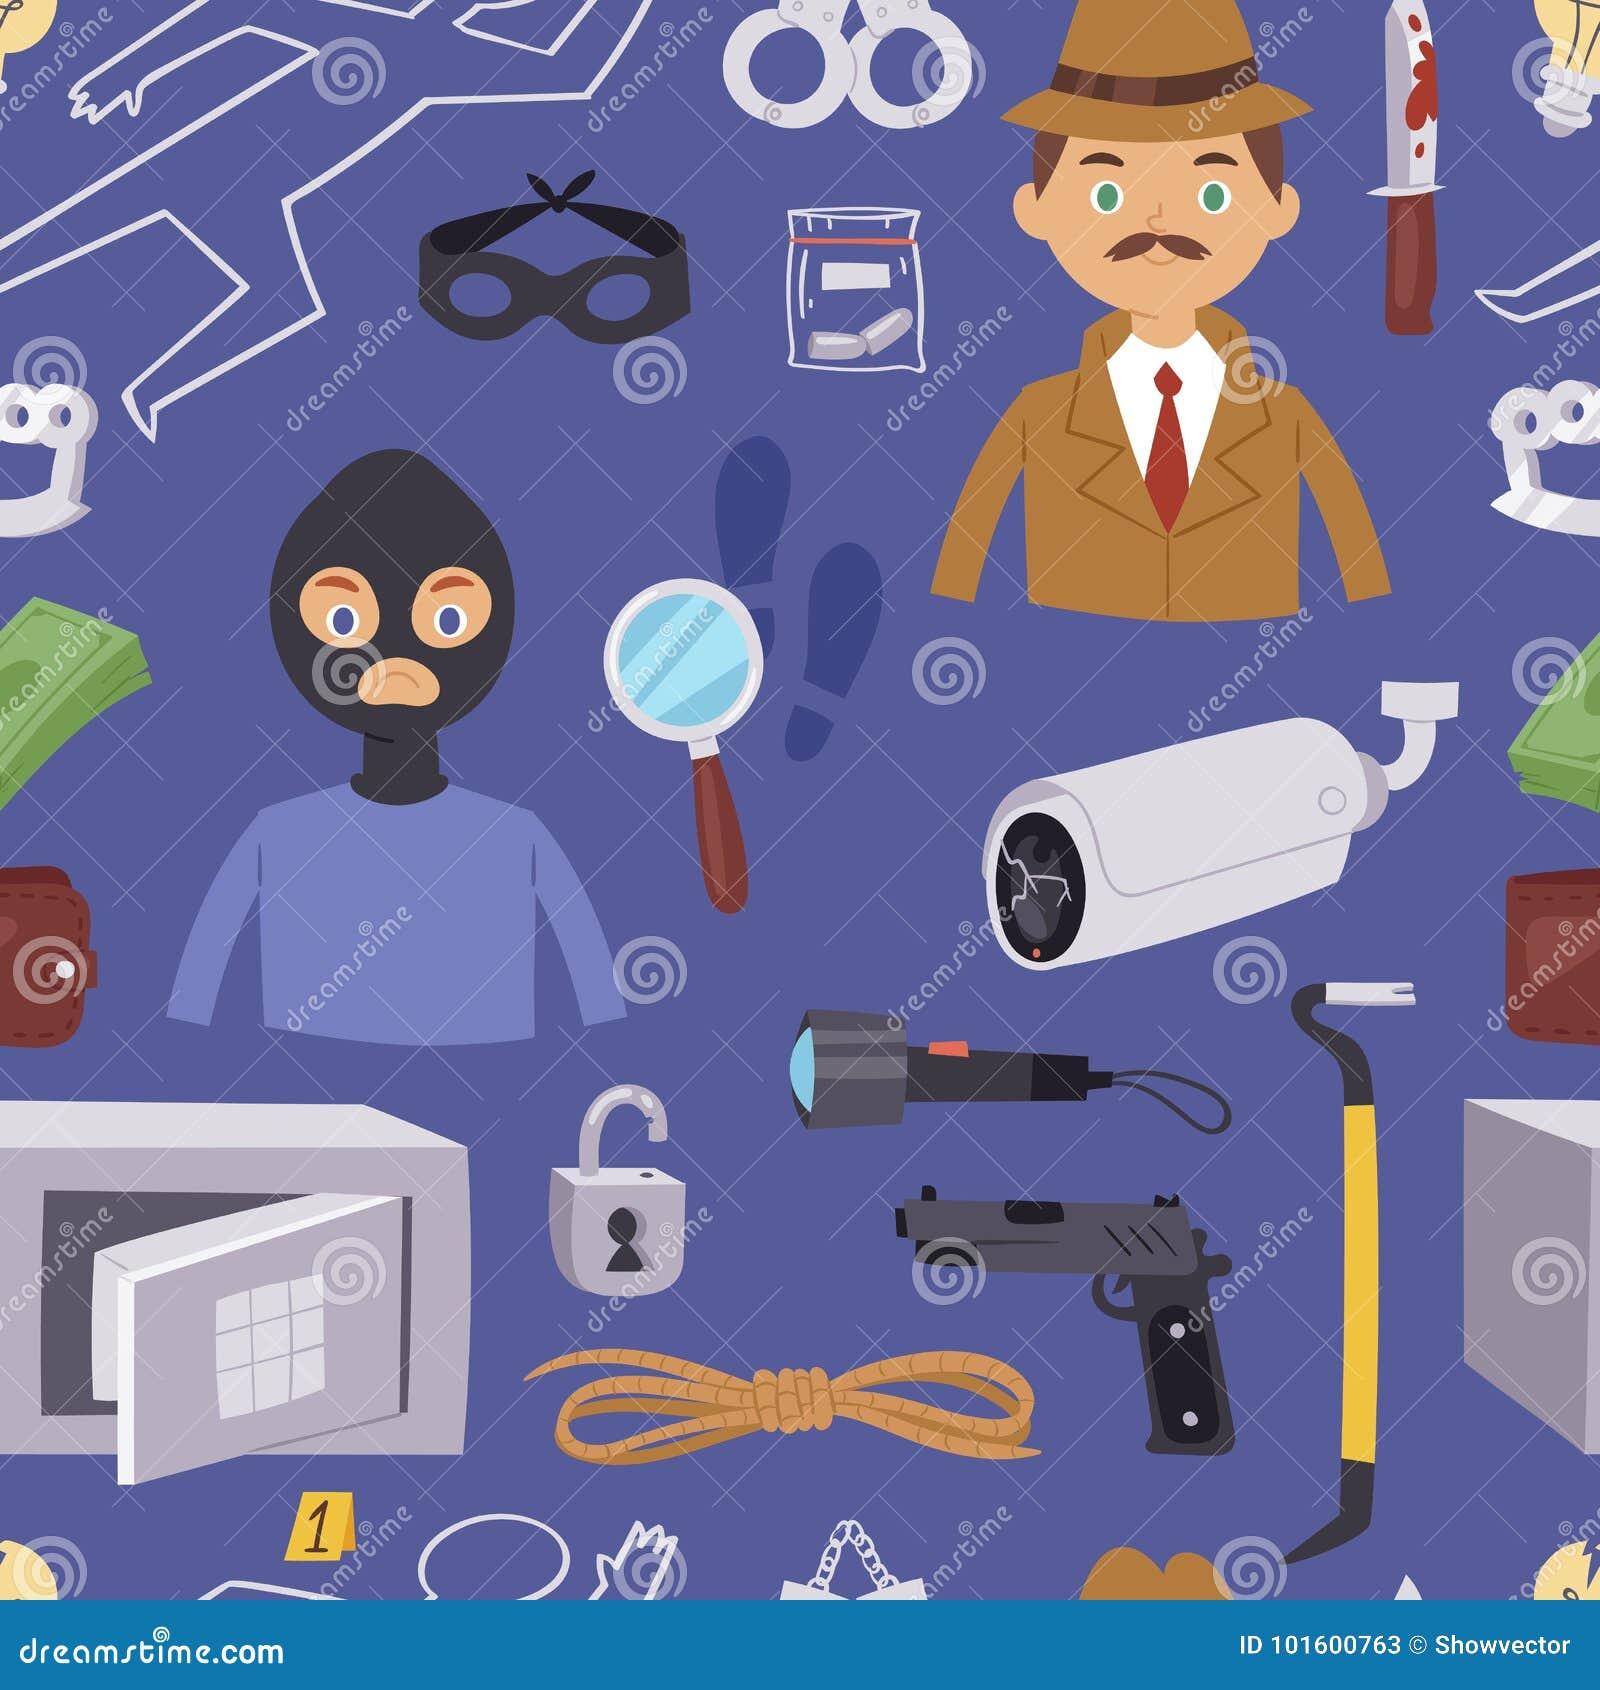 Cartoon Detective Characters Cartoon Vector